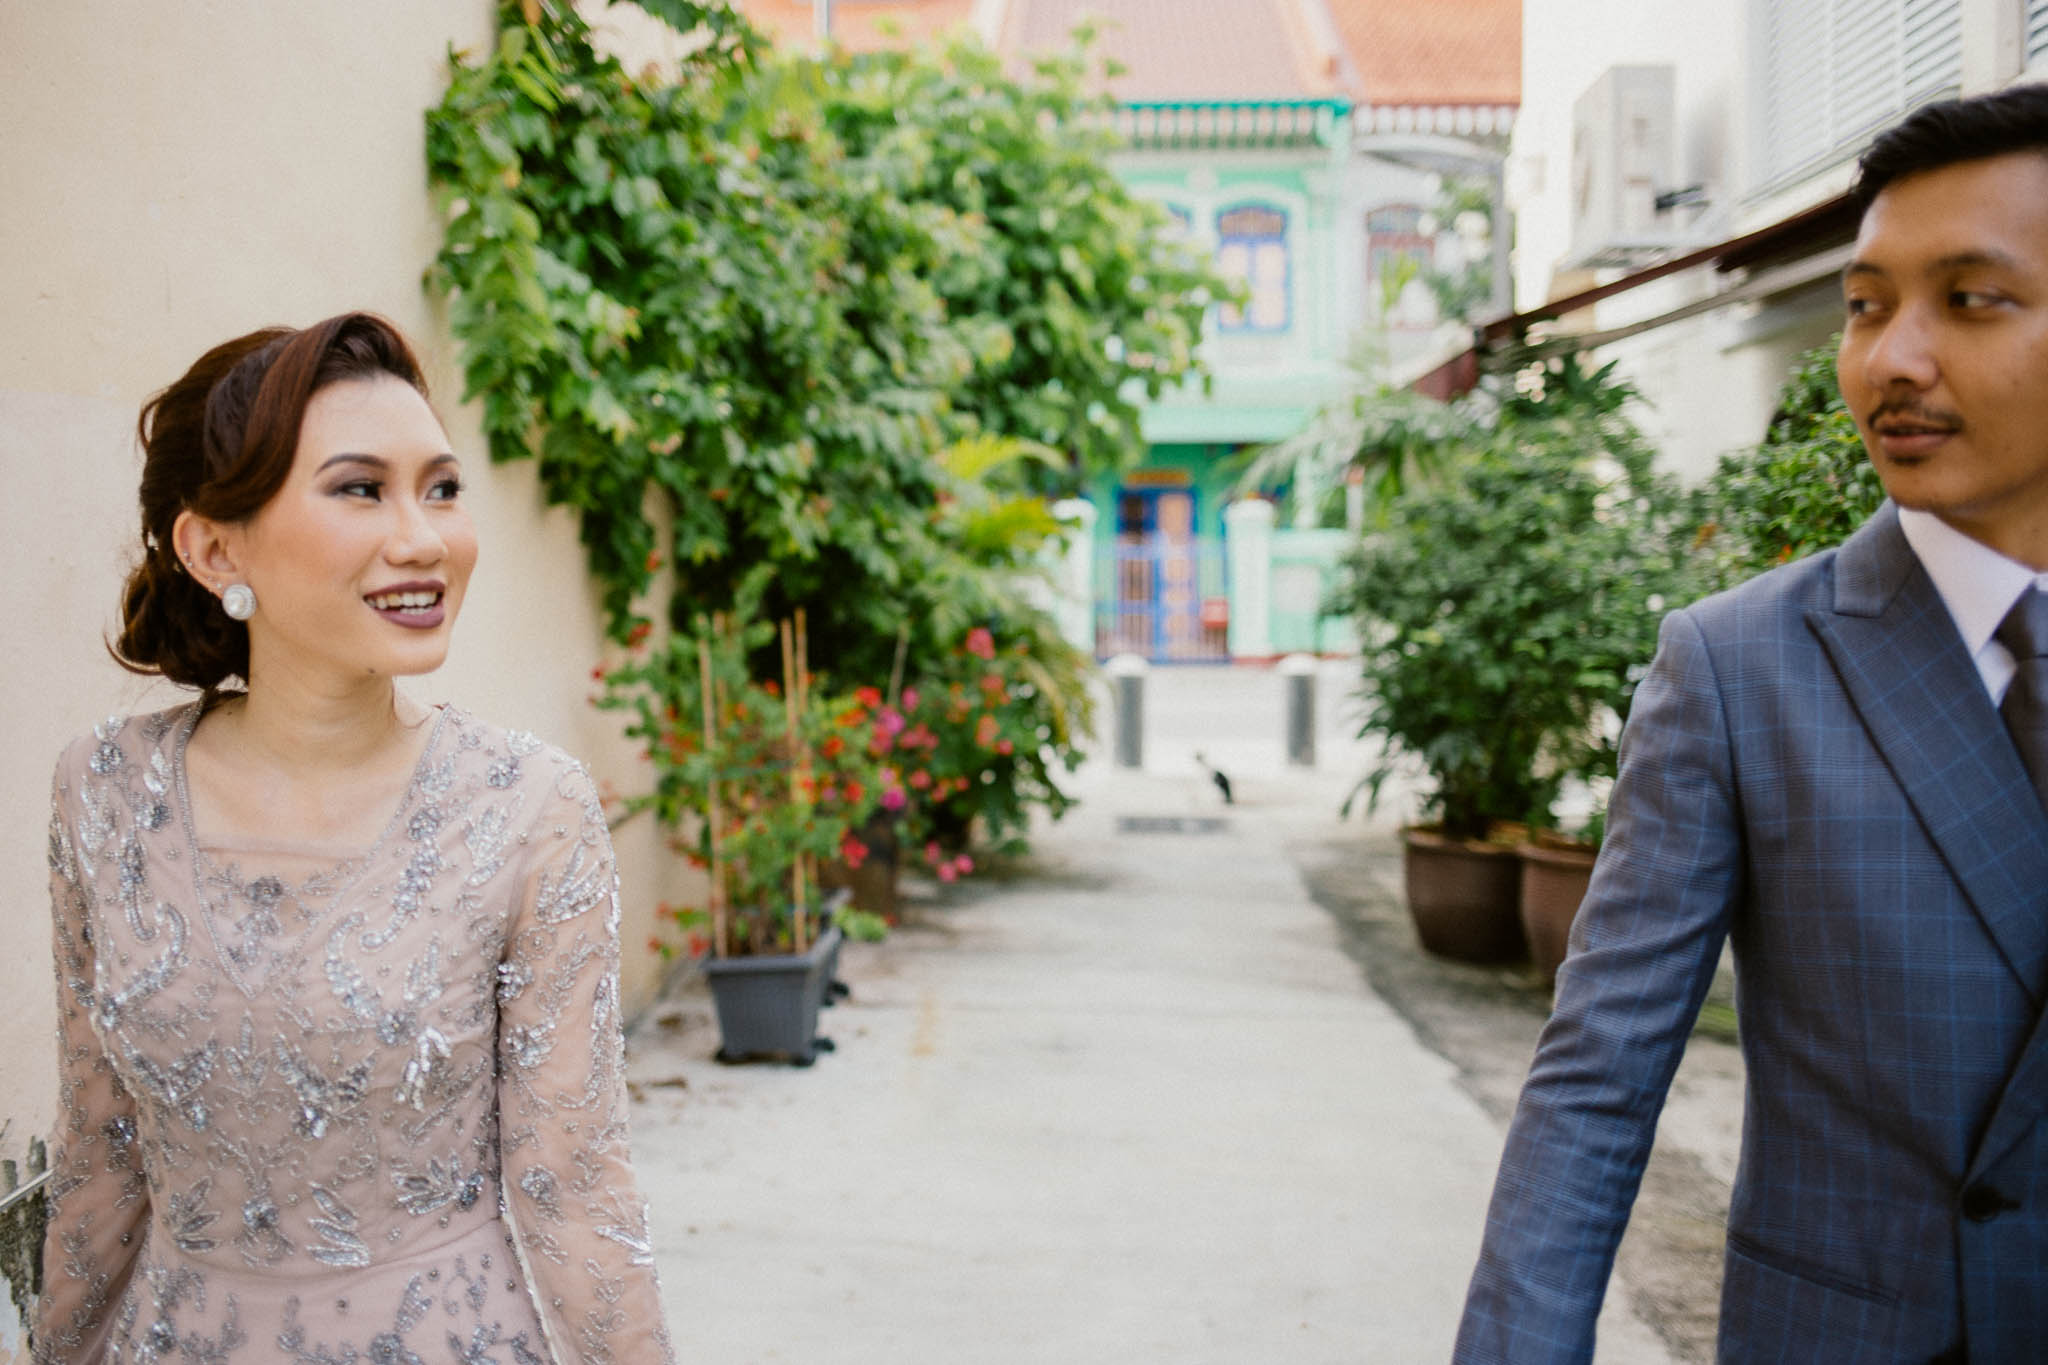 singapore-wedding-photographer-addafiq-nufail-080.jpg